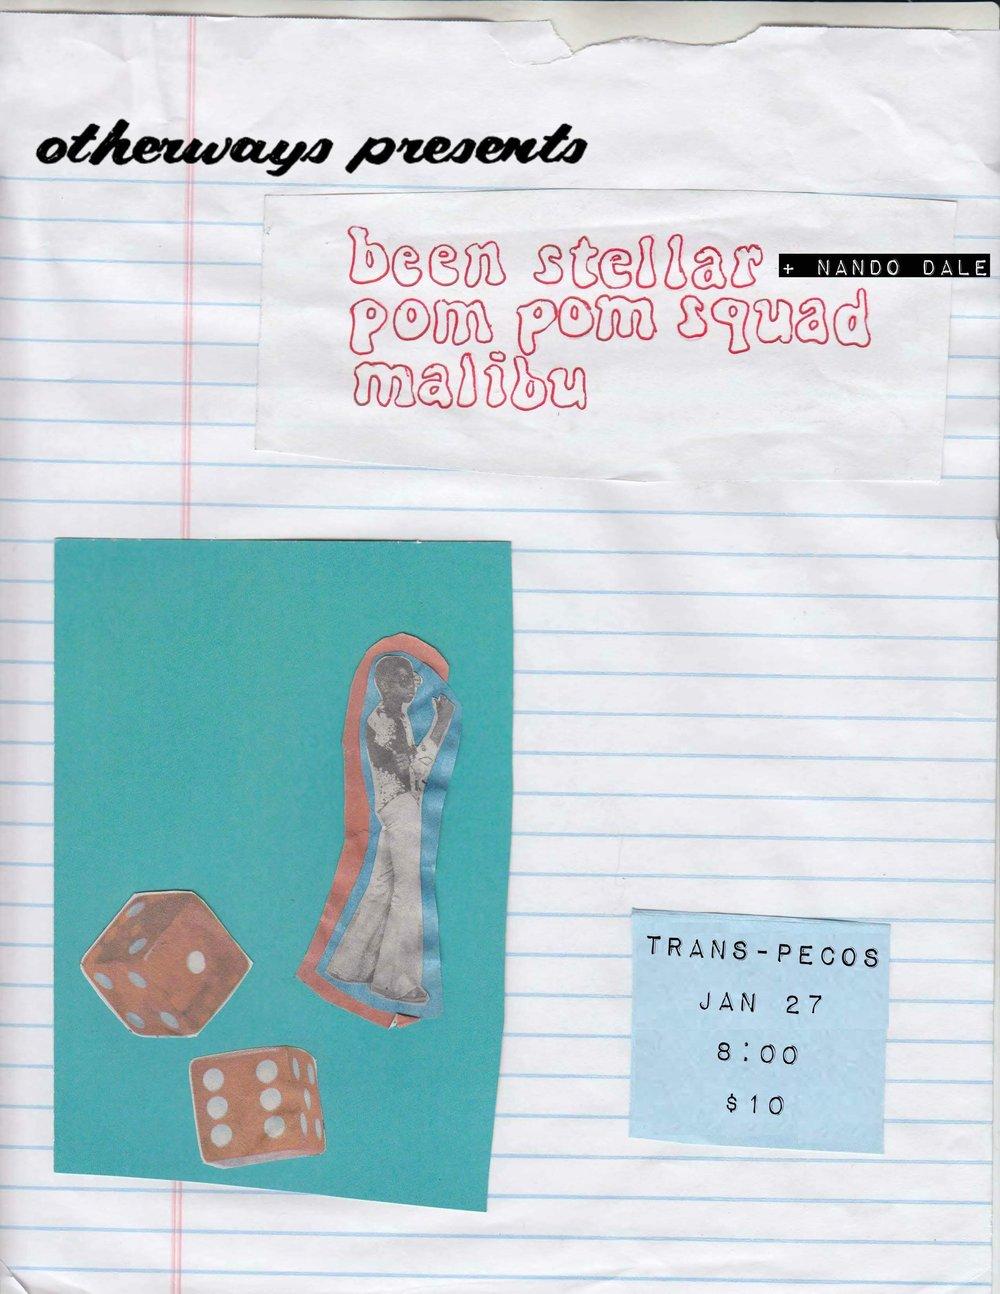 Otherways Presents-  Been Stellar + Nando Dale   https://open.spotify.com/artist/3ep1YmatQ8L9UKCGYiJNBh   https://open.spotify.com/artist/6tiYfbgTWLC4CwsYhCwnlL   Pom Pom Squad   https://pompomsquad.bandcamp.com/   Malibu NJ   https://open.spotify.com/album/2w6qykr00kLZTQVNwKKWLE